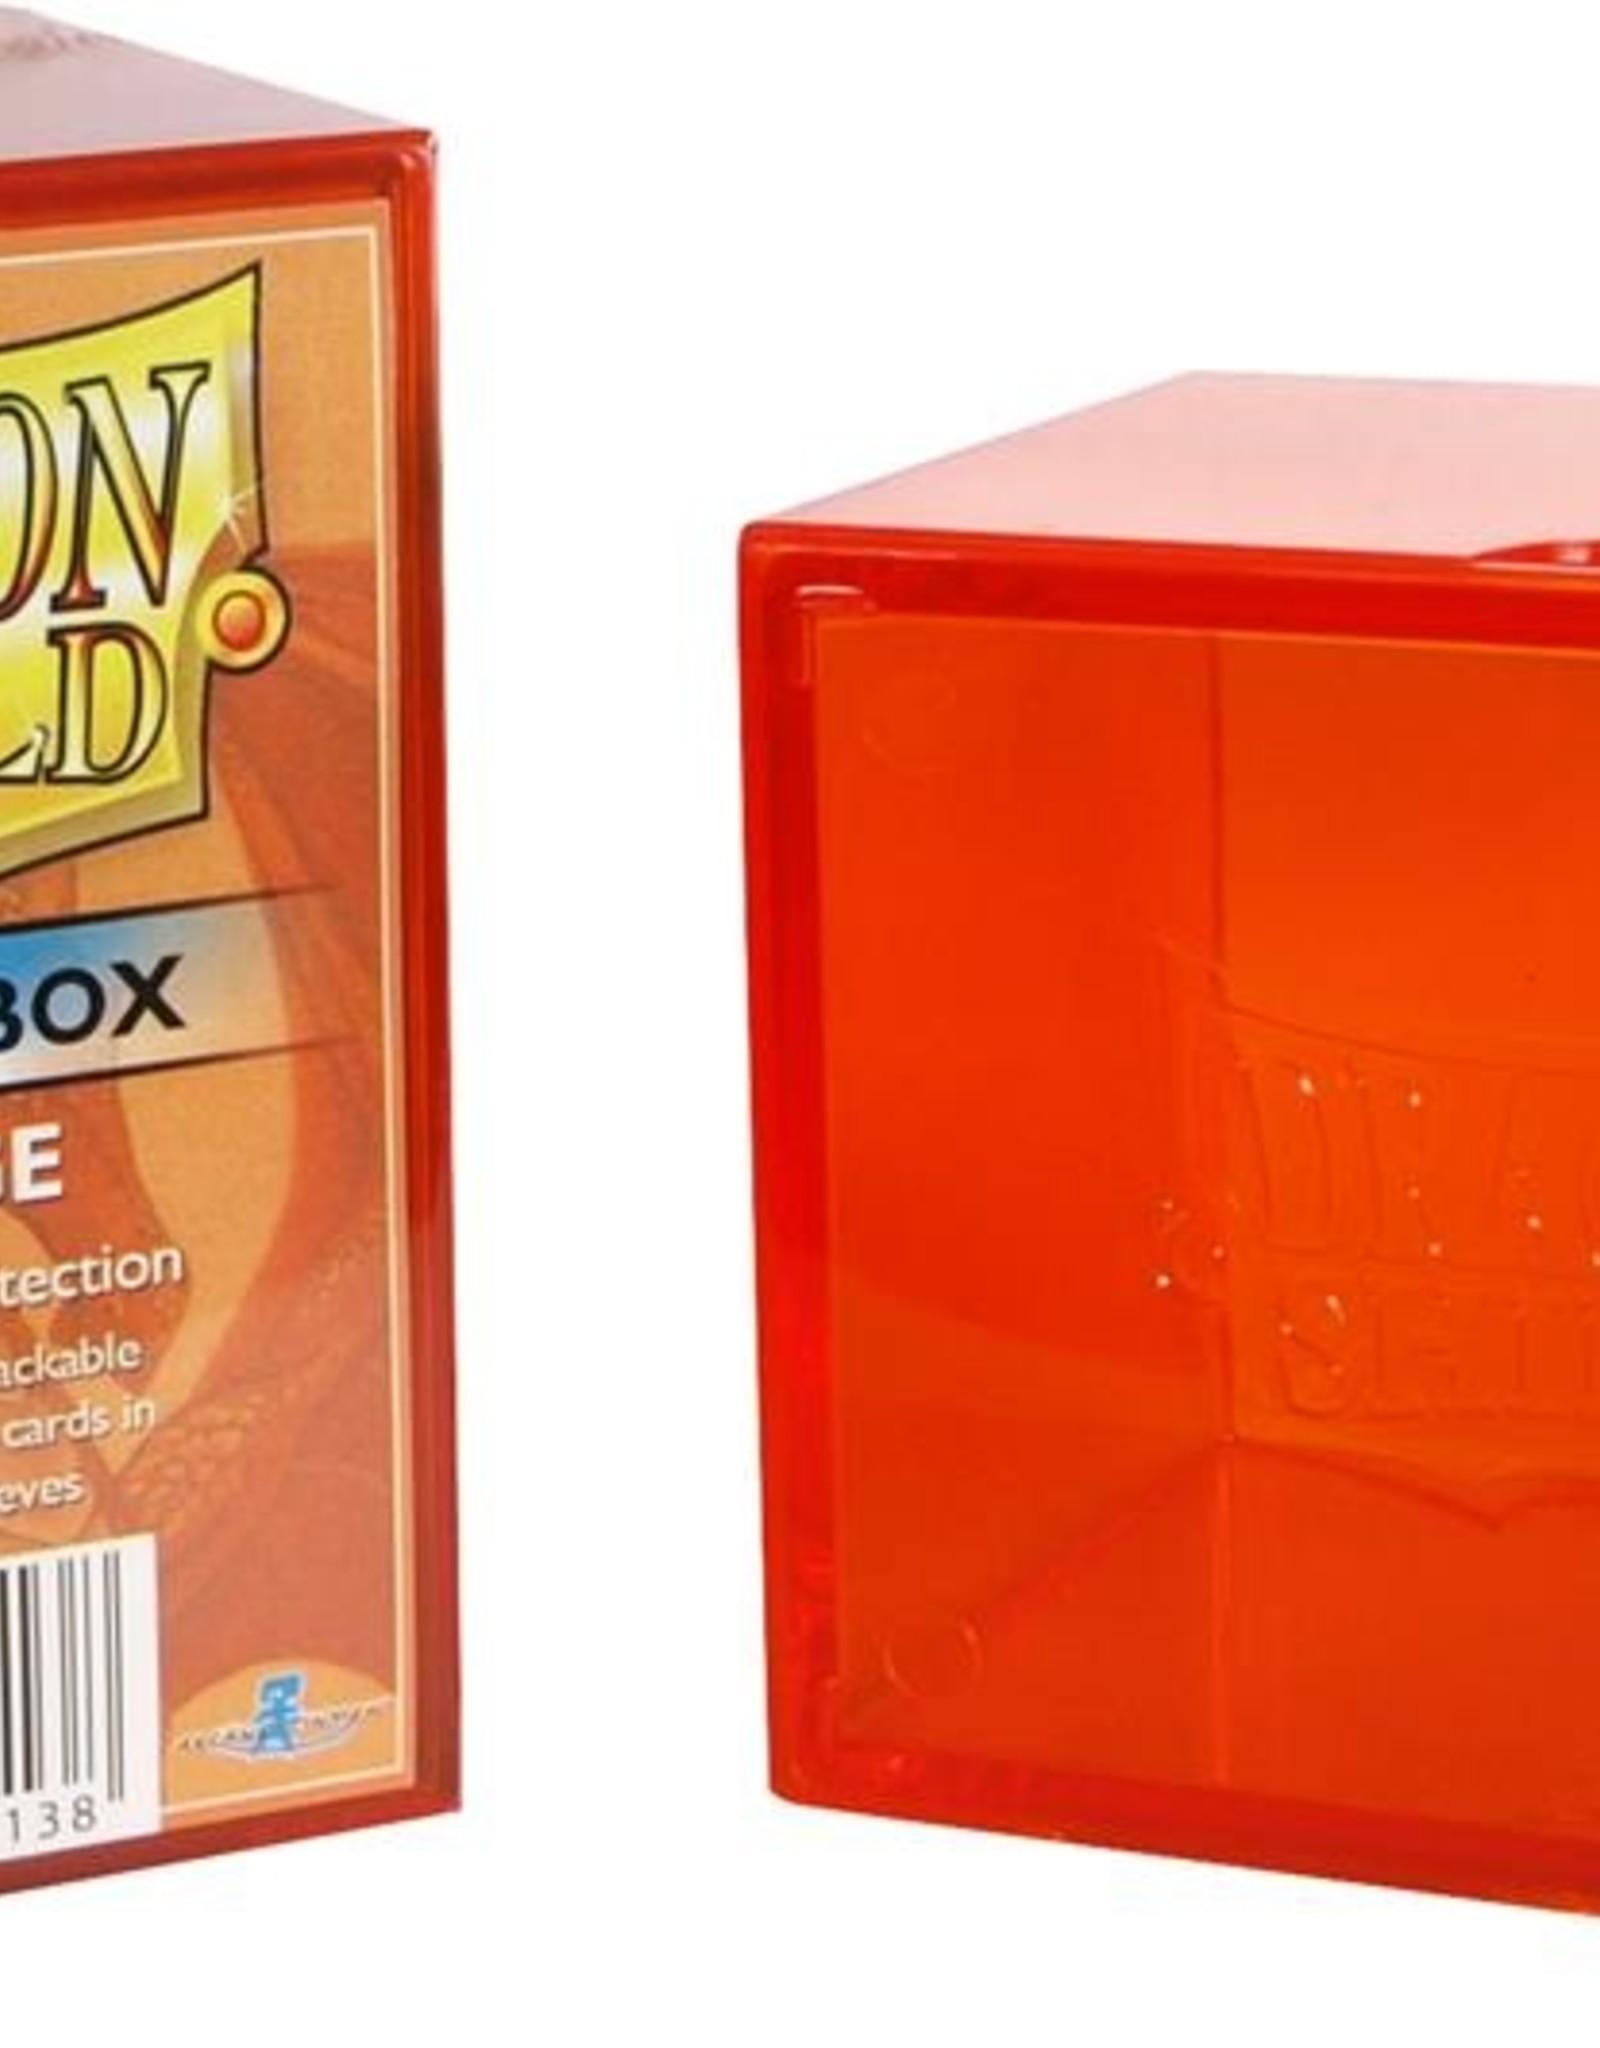 Dragonshield Dragonshield Strongbox Orange